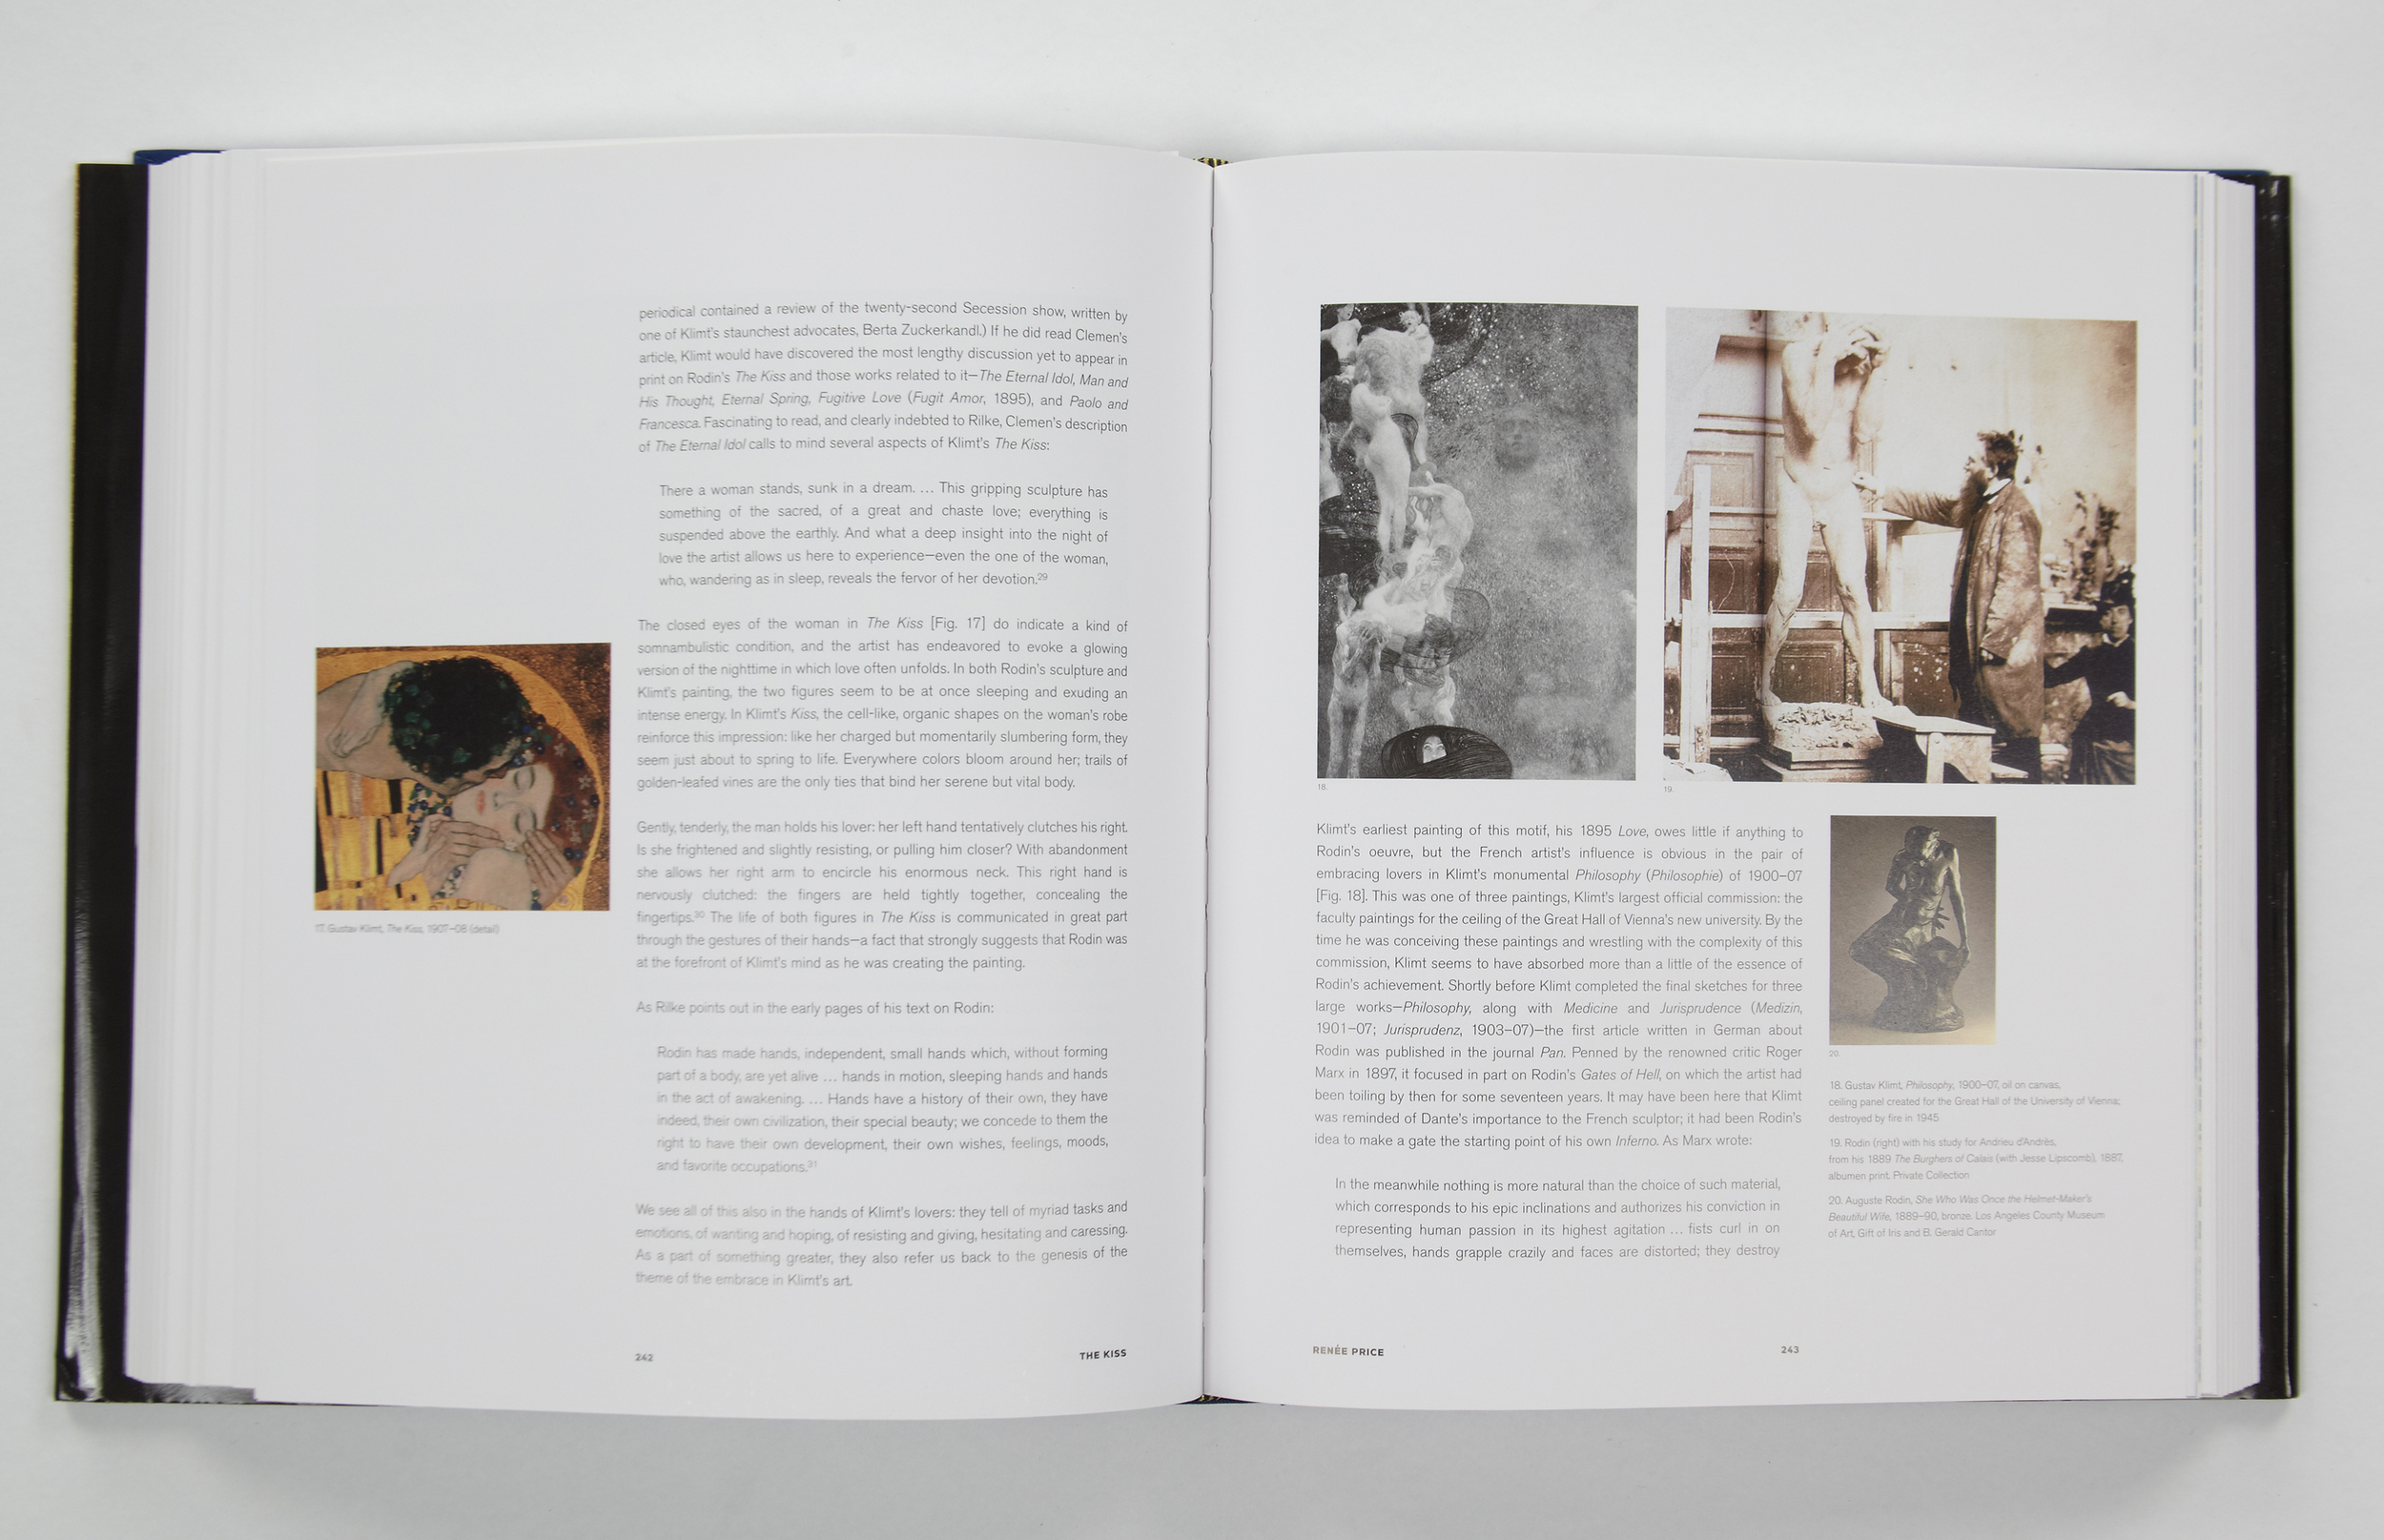 MG_Klimt_bookpost__0012_TSE_Invitations__592.jpg.jpg